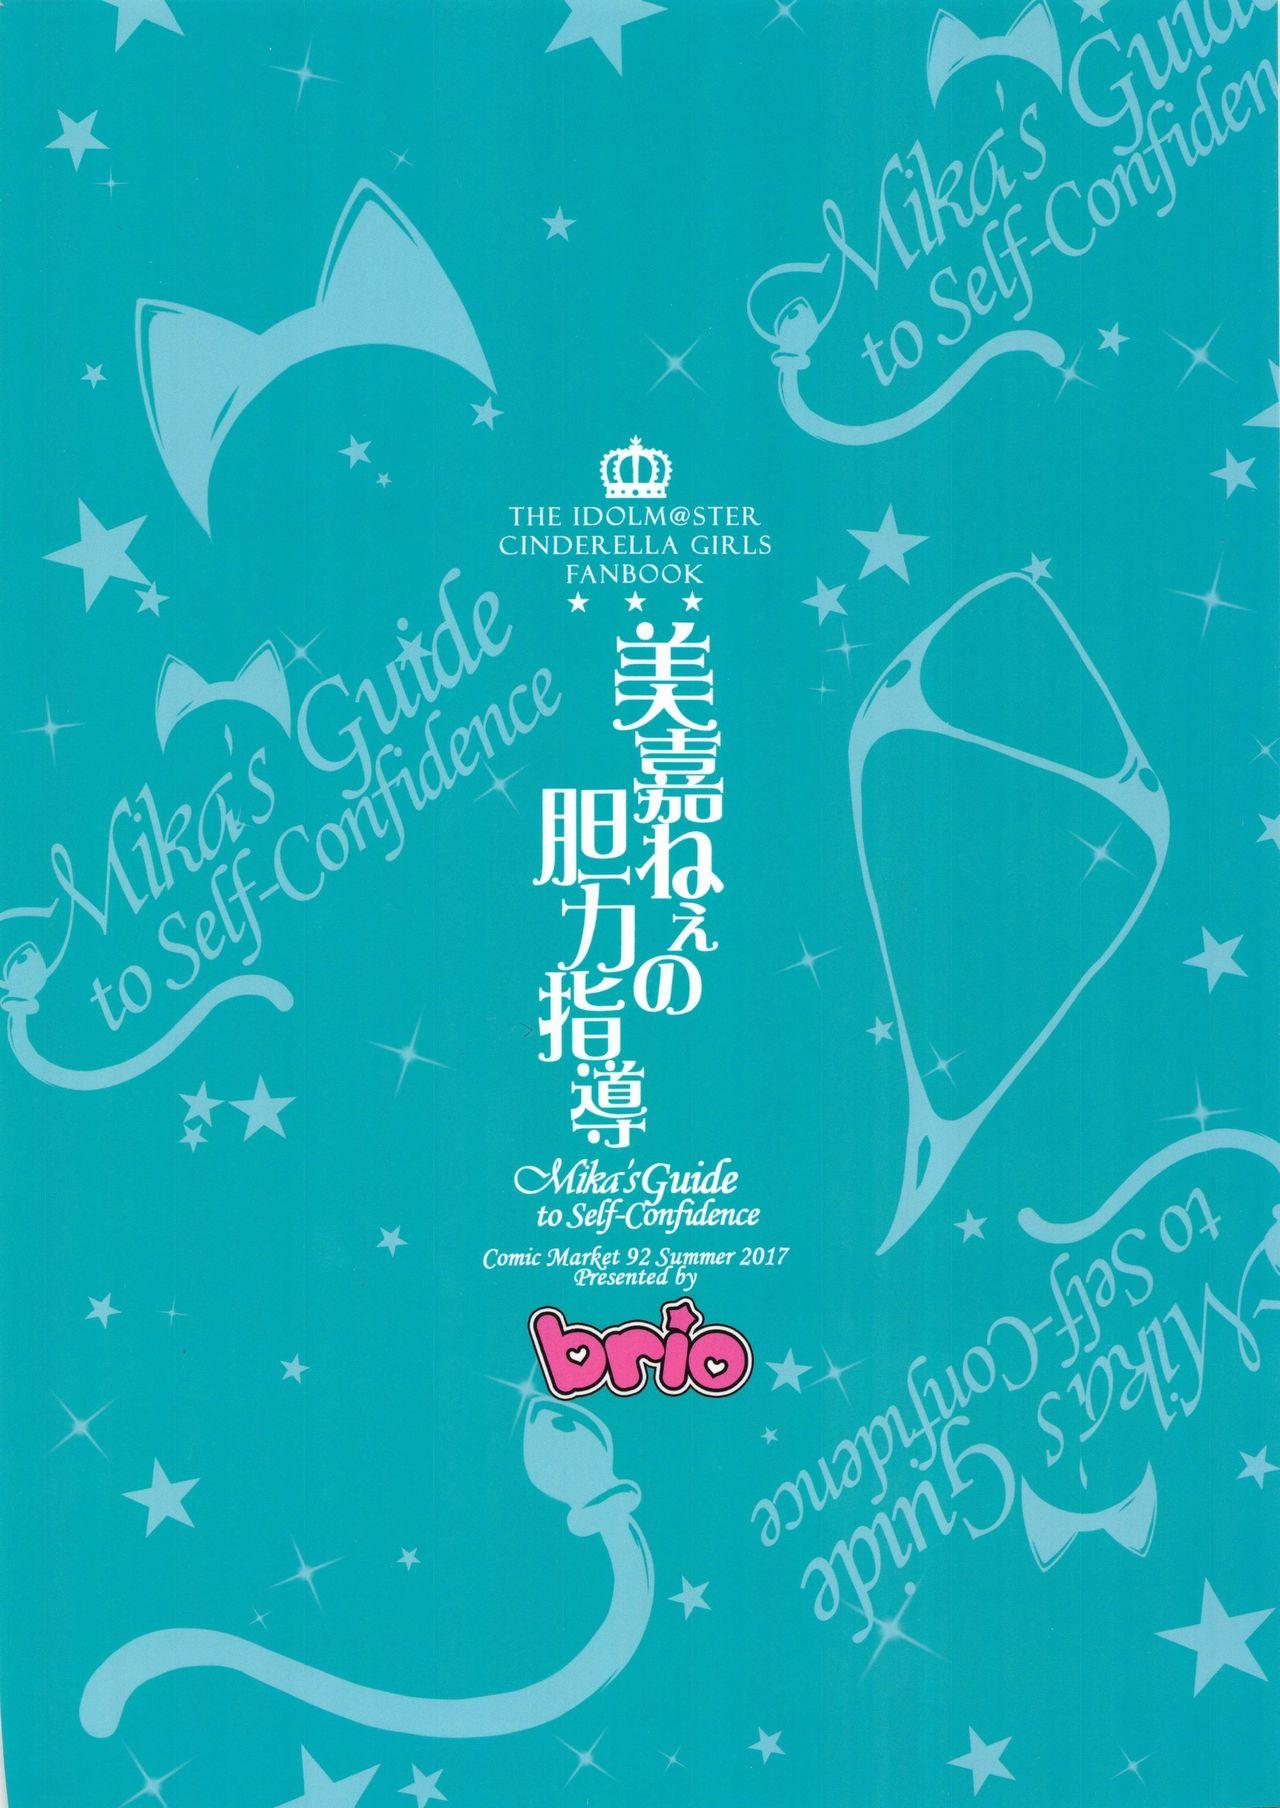 (C92) [BRIO (Puyocha)] Mika-nee no Tanryoku Shidou - Mika's Guide to Self-Confidence (THE IDOLM@STER CINDERELLA GIRLS) 25